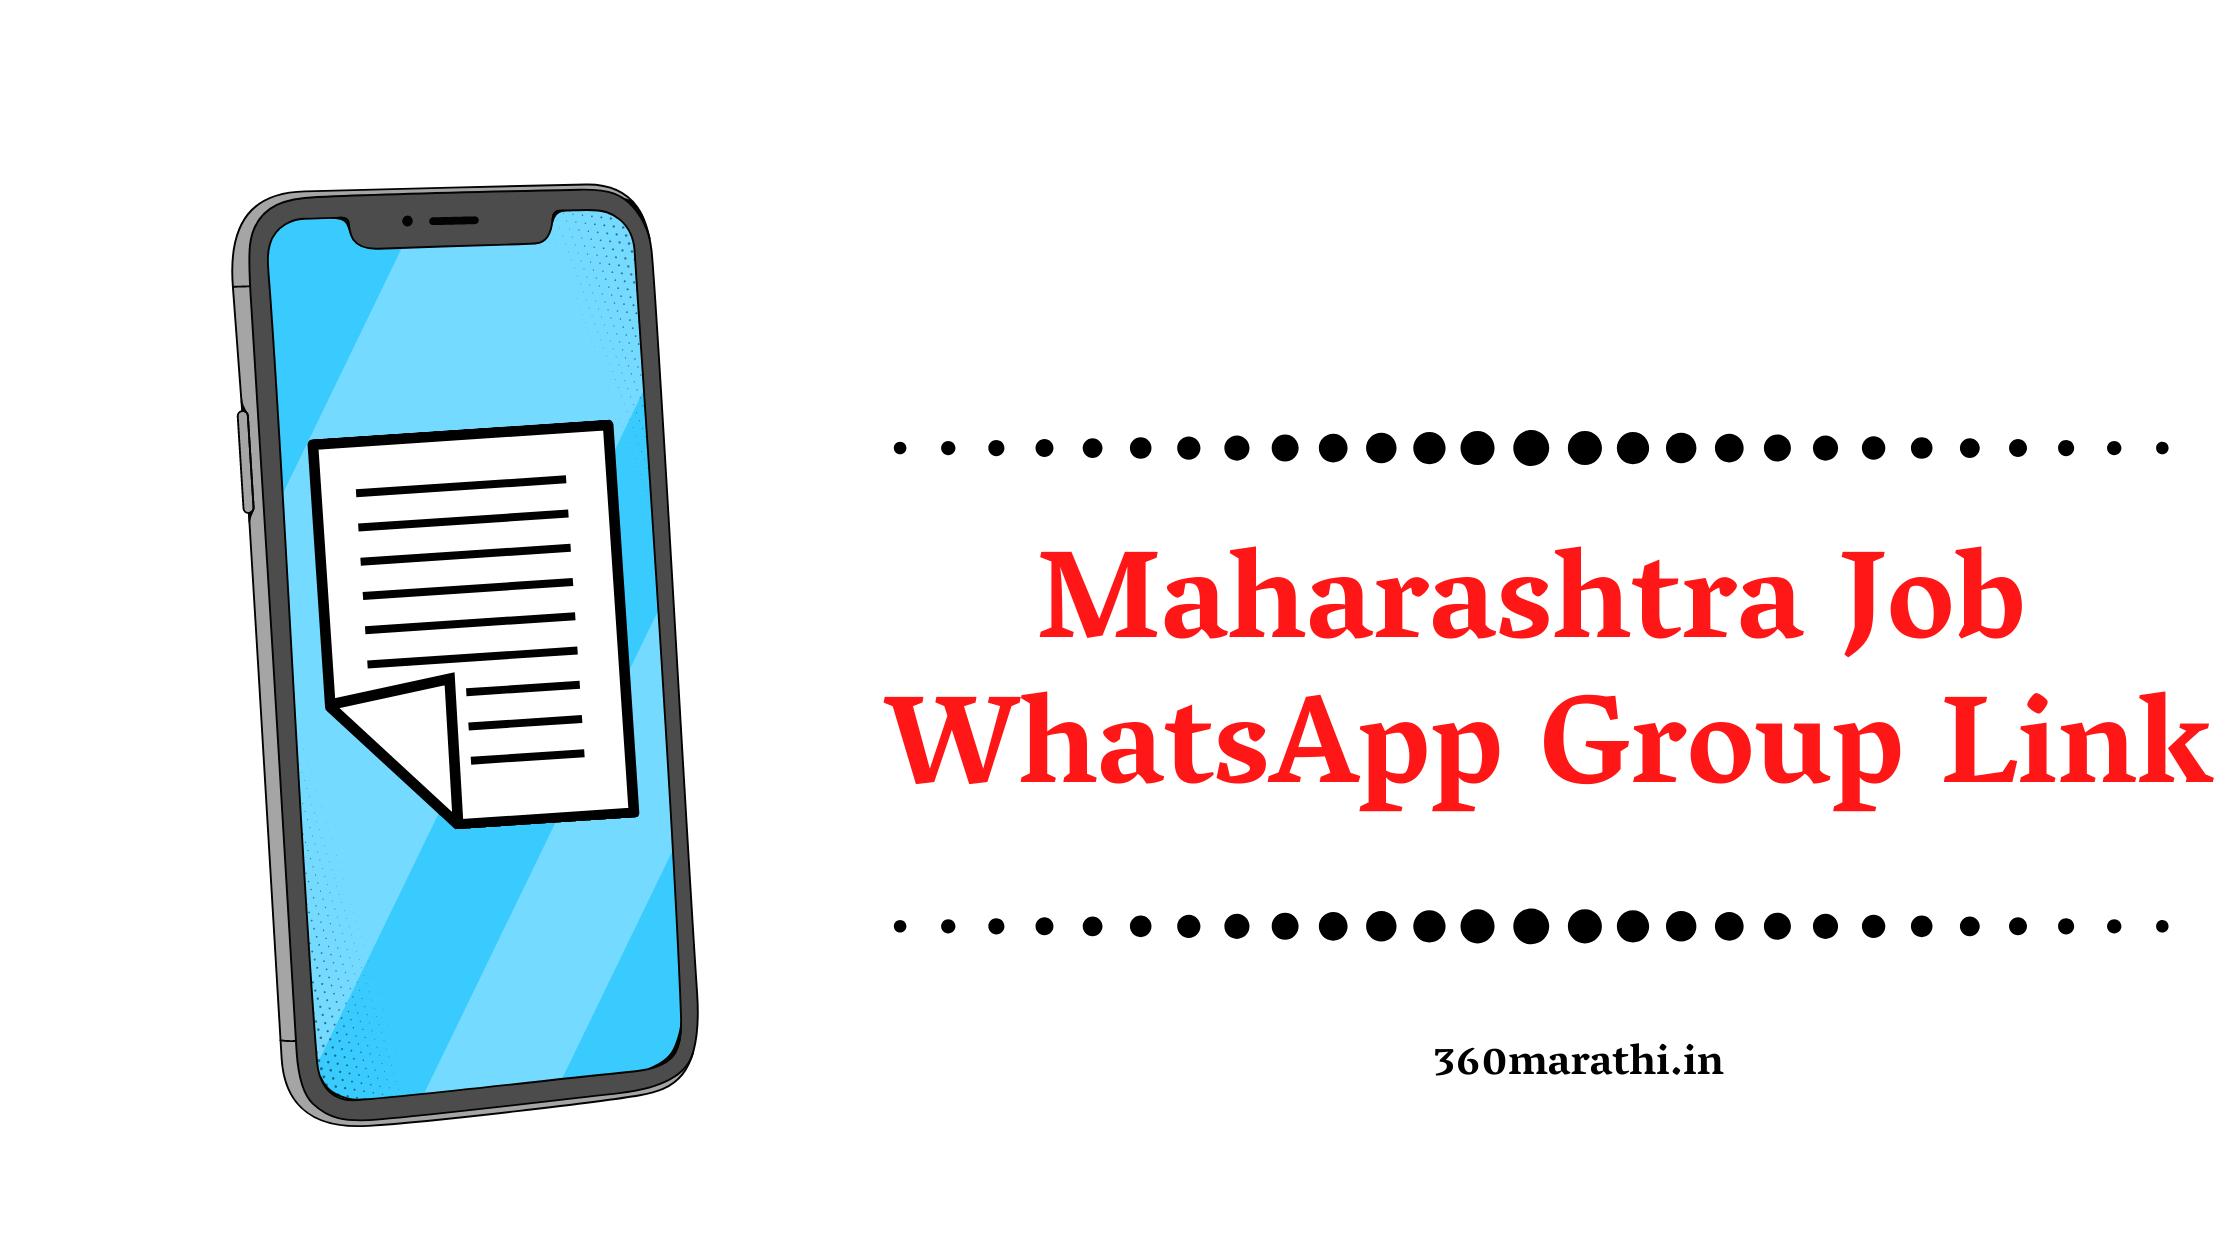 (Govt + Private) Maharashtra Job WhatsApp Group Link   Maharashtra Government Jobs/Vacancies Whatsapp Group Link